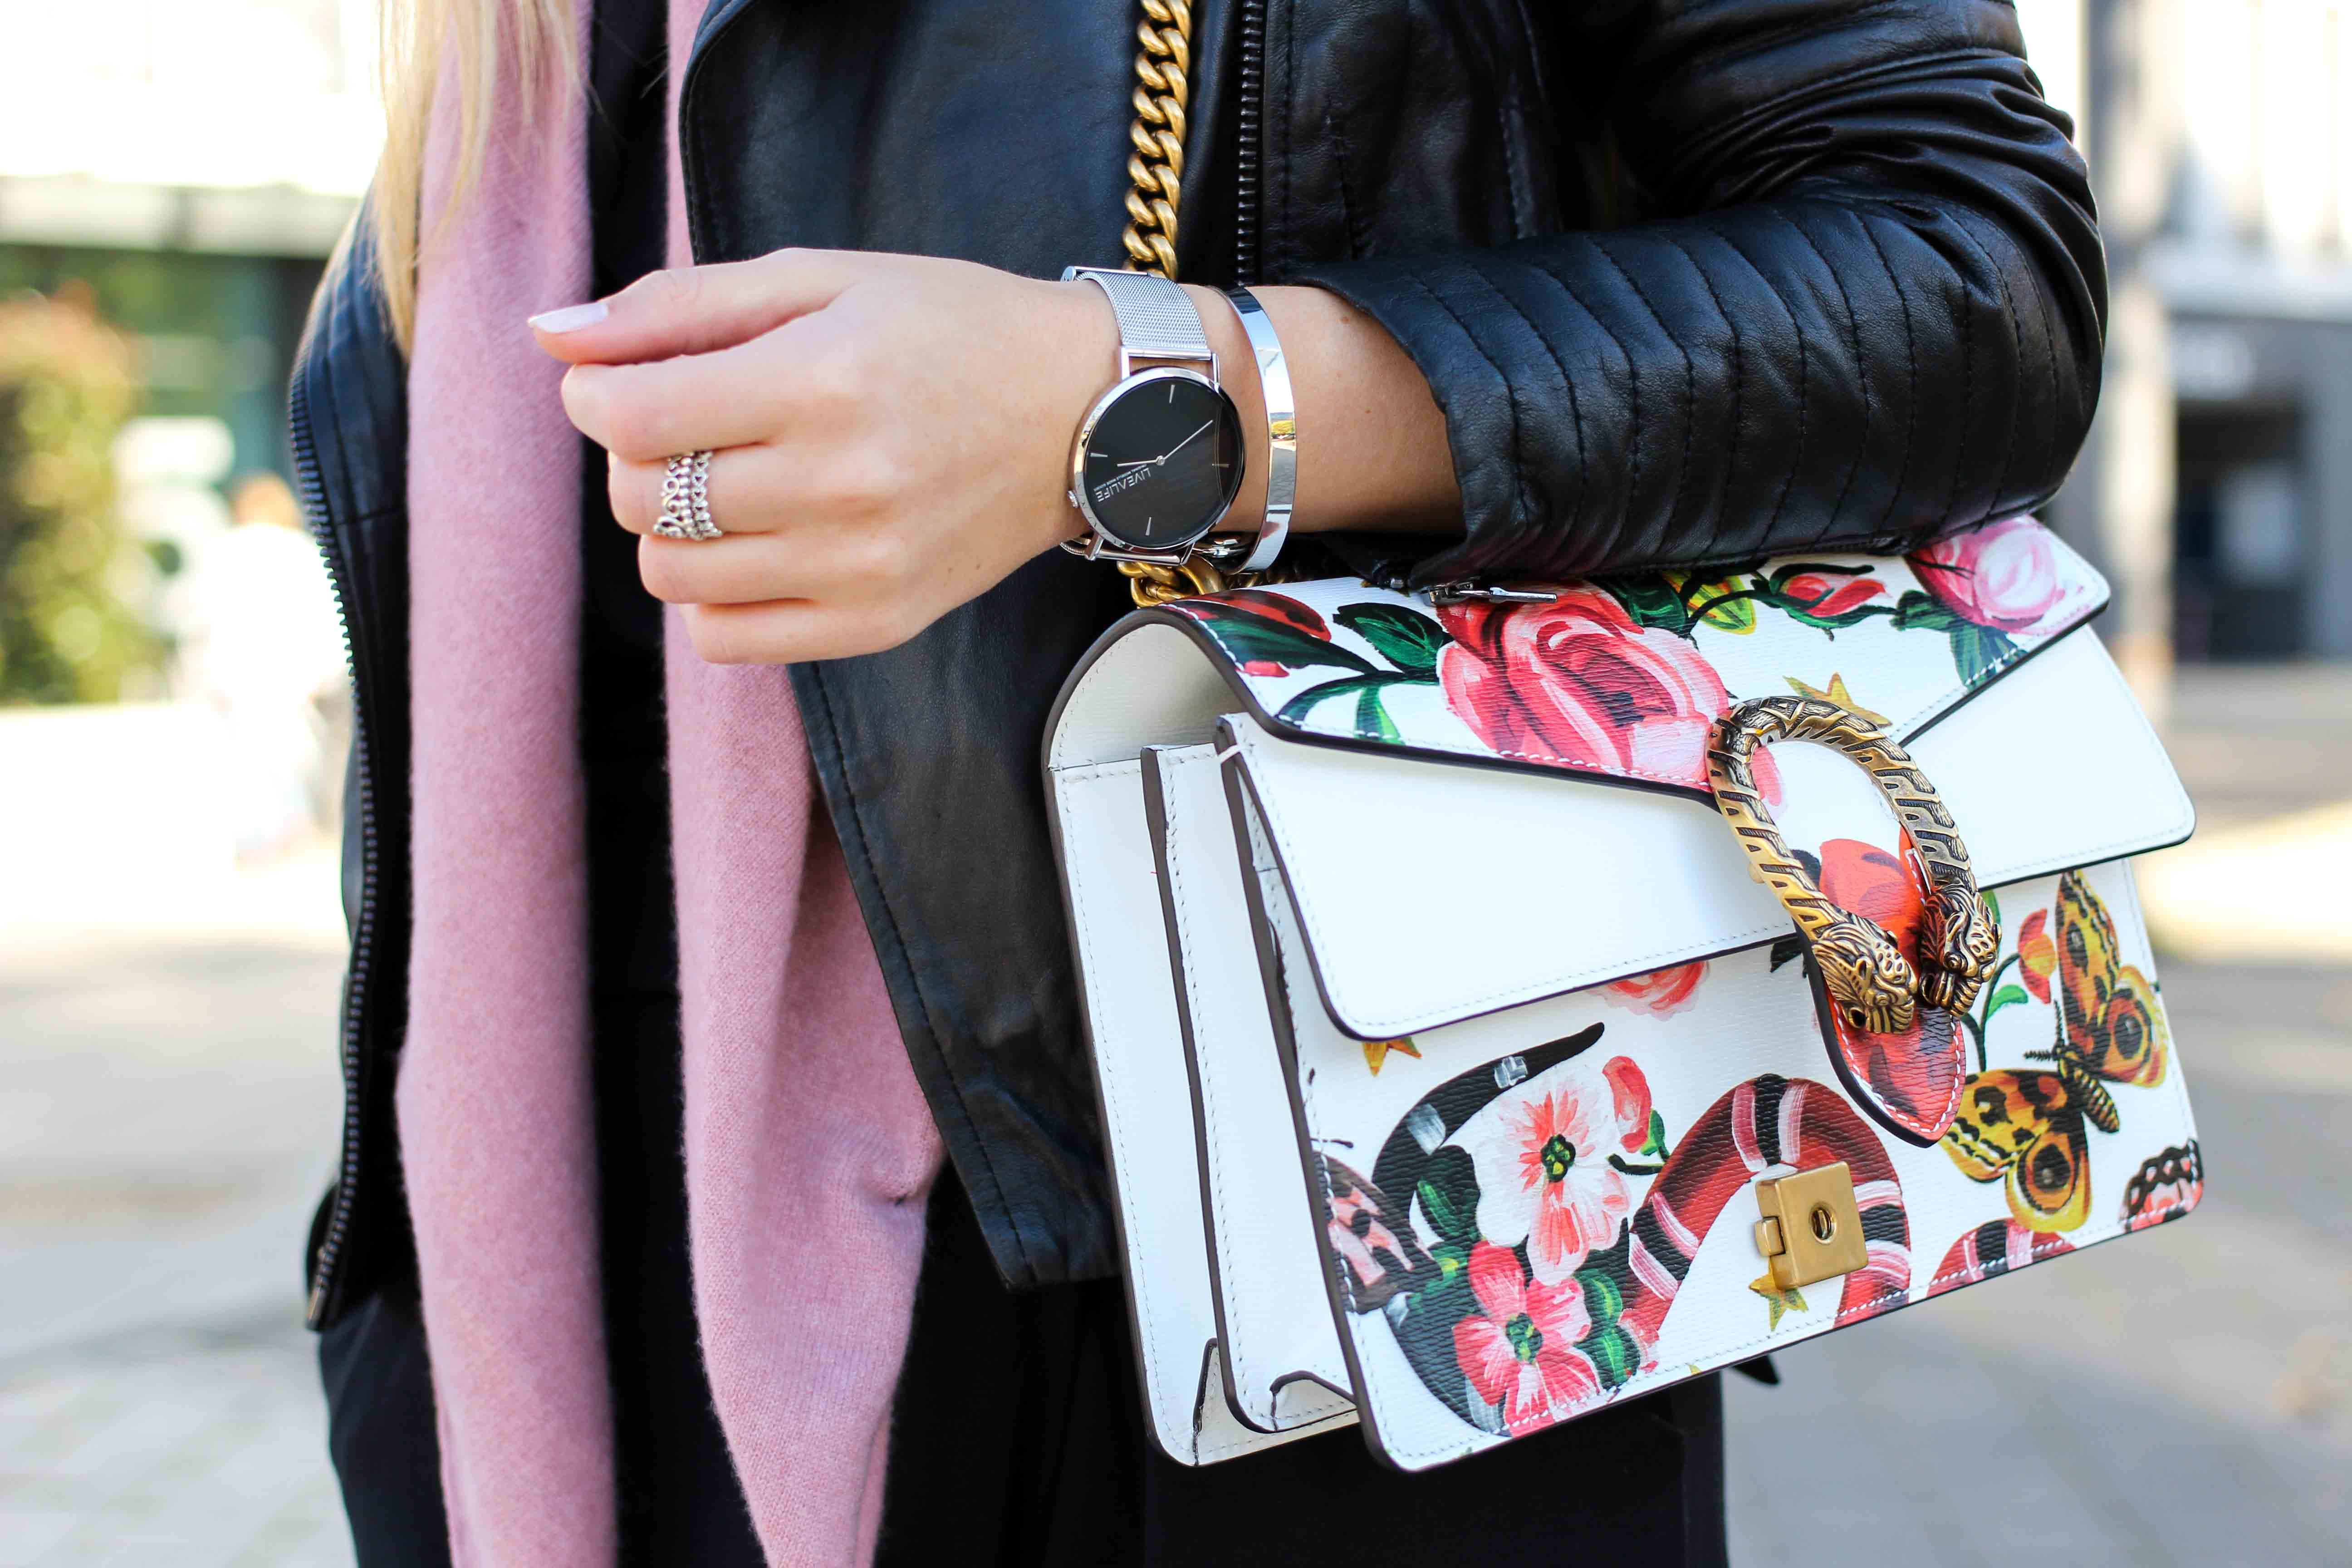 Rosa Kaschmir Schal Gucci Dionysus Garden Print Lederjacke Modeblog Outfit Herbsttrend 3